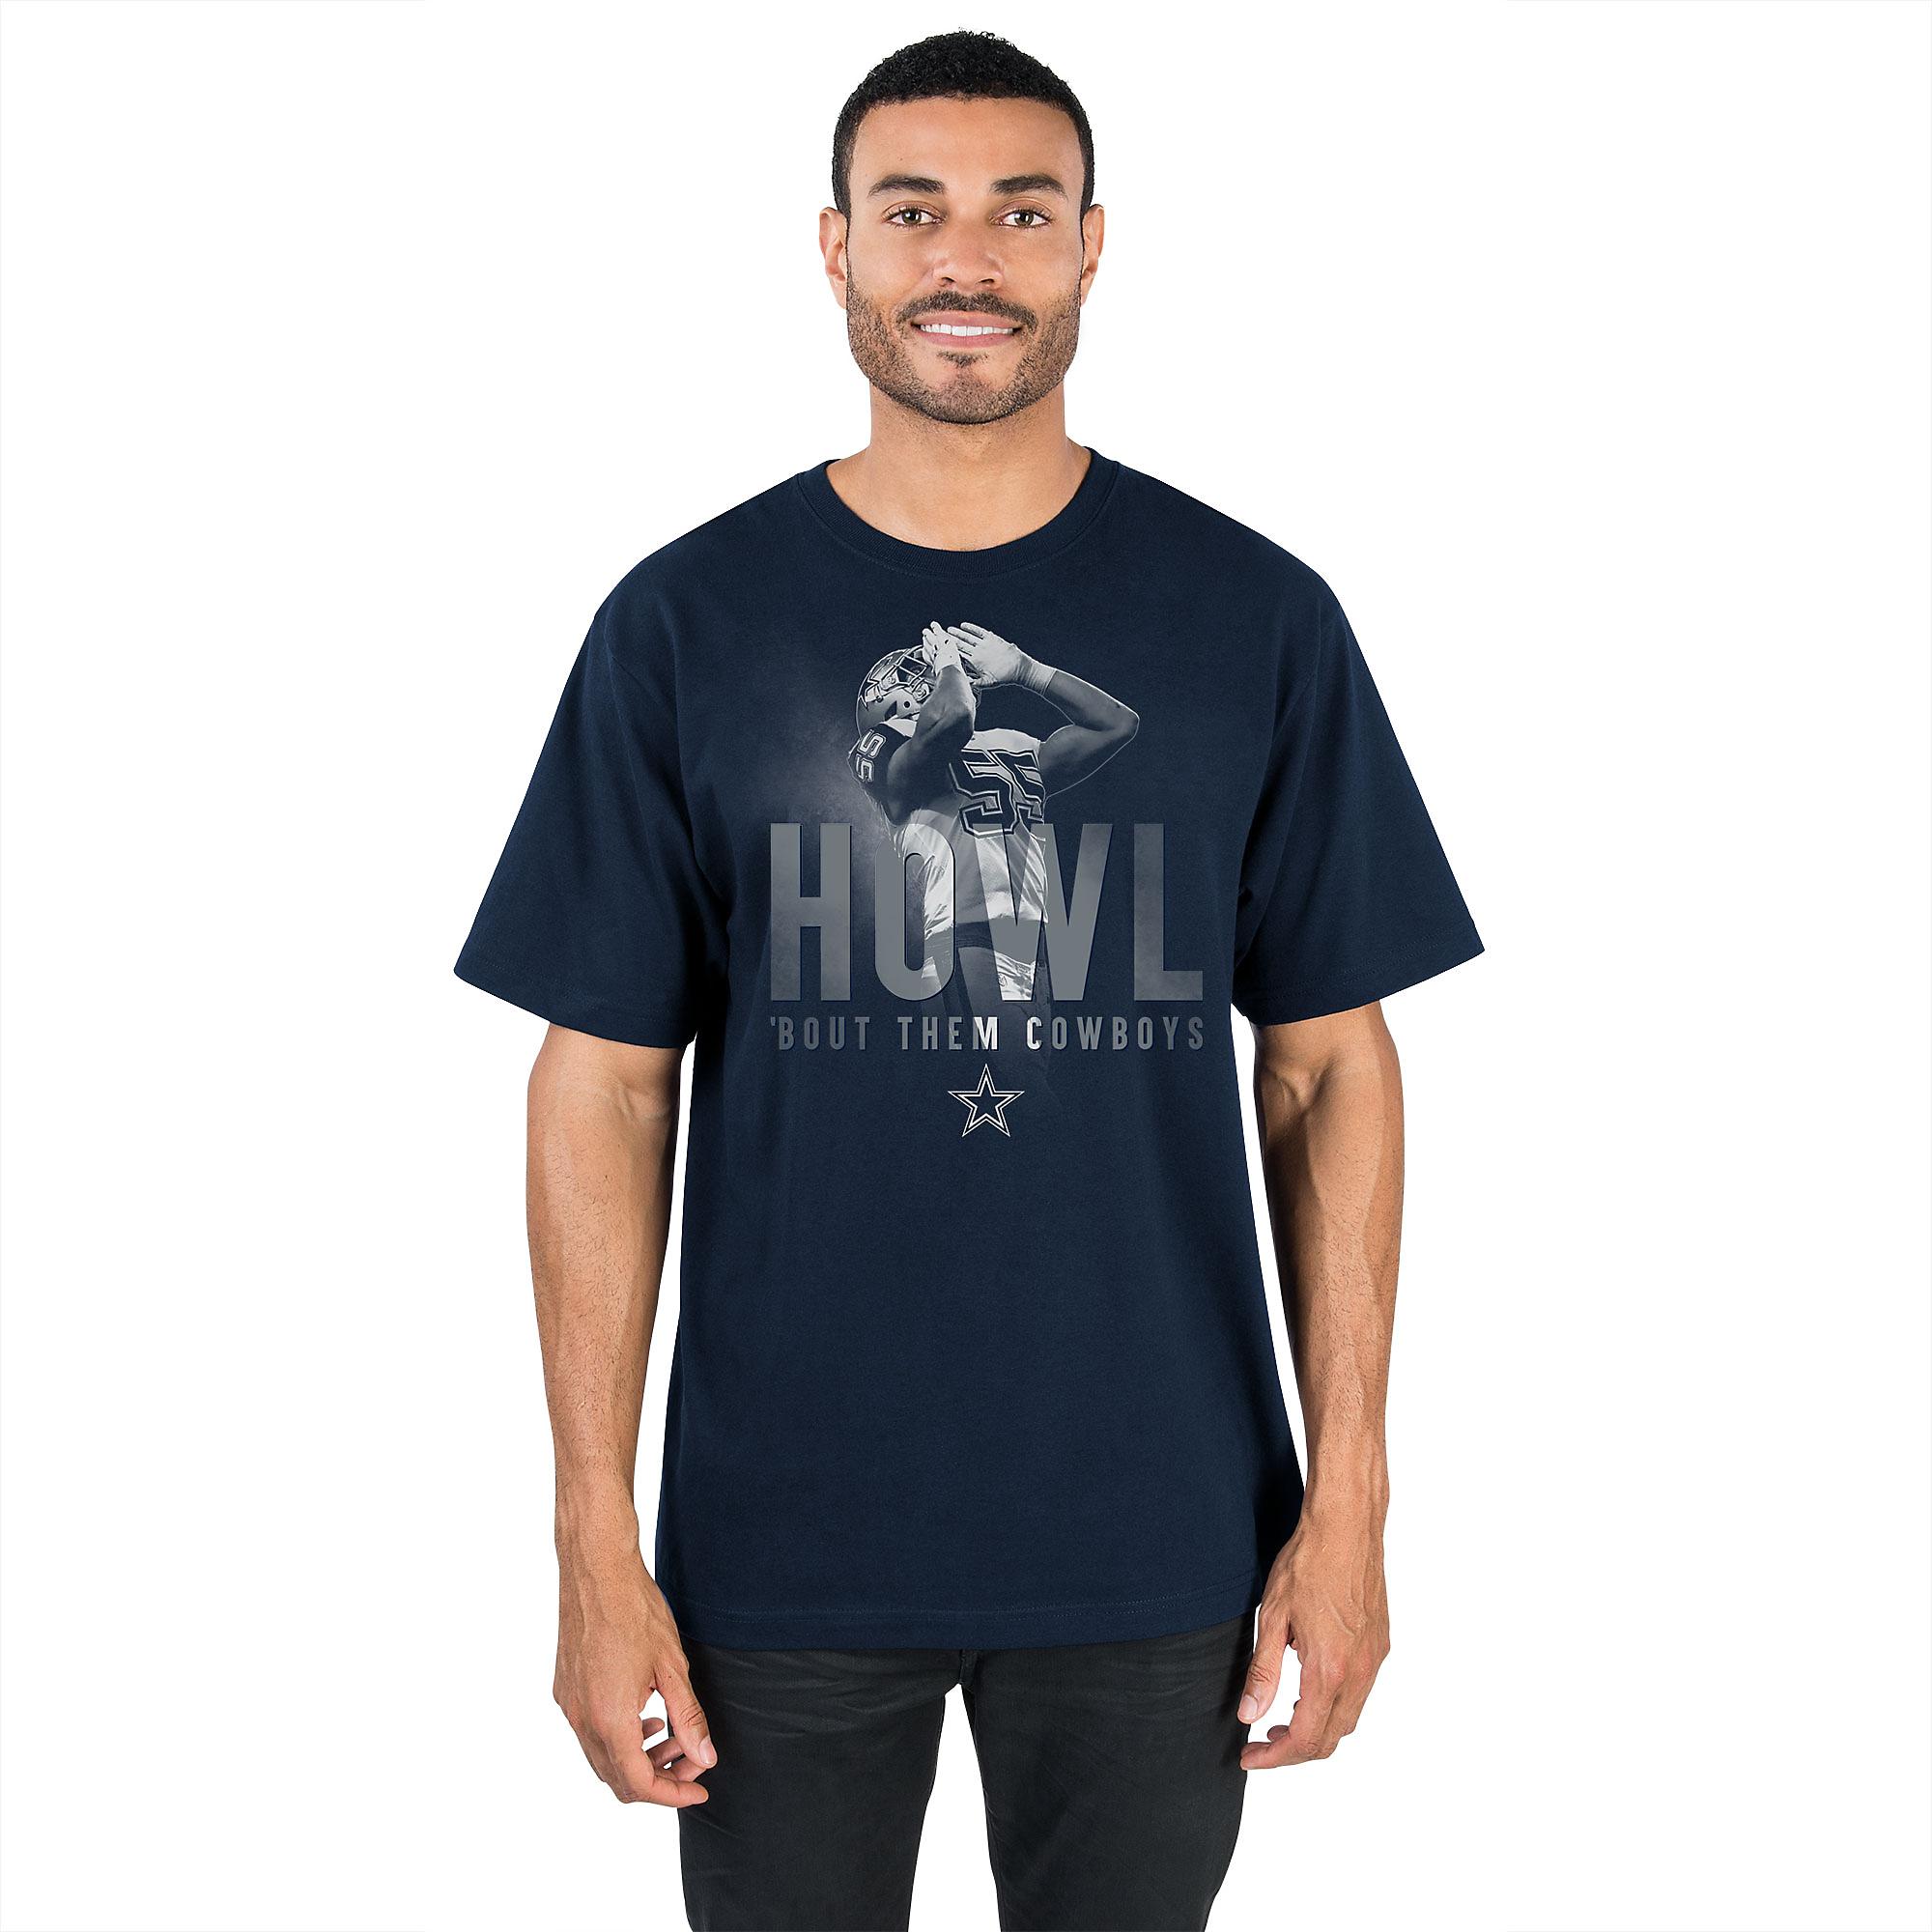 Dallas Cowboys Leighton Vander Esch Howl Bout Them Cowboys Tee